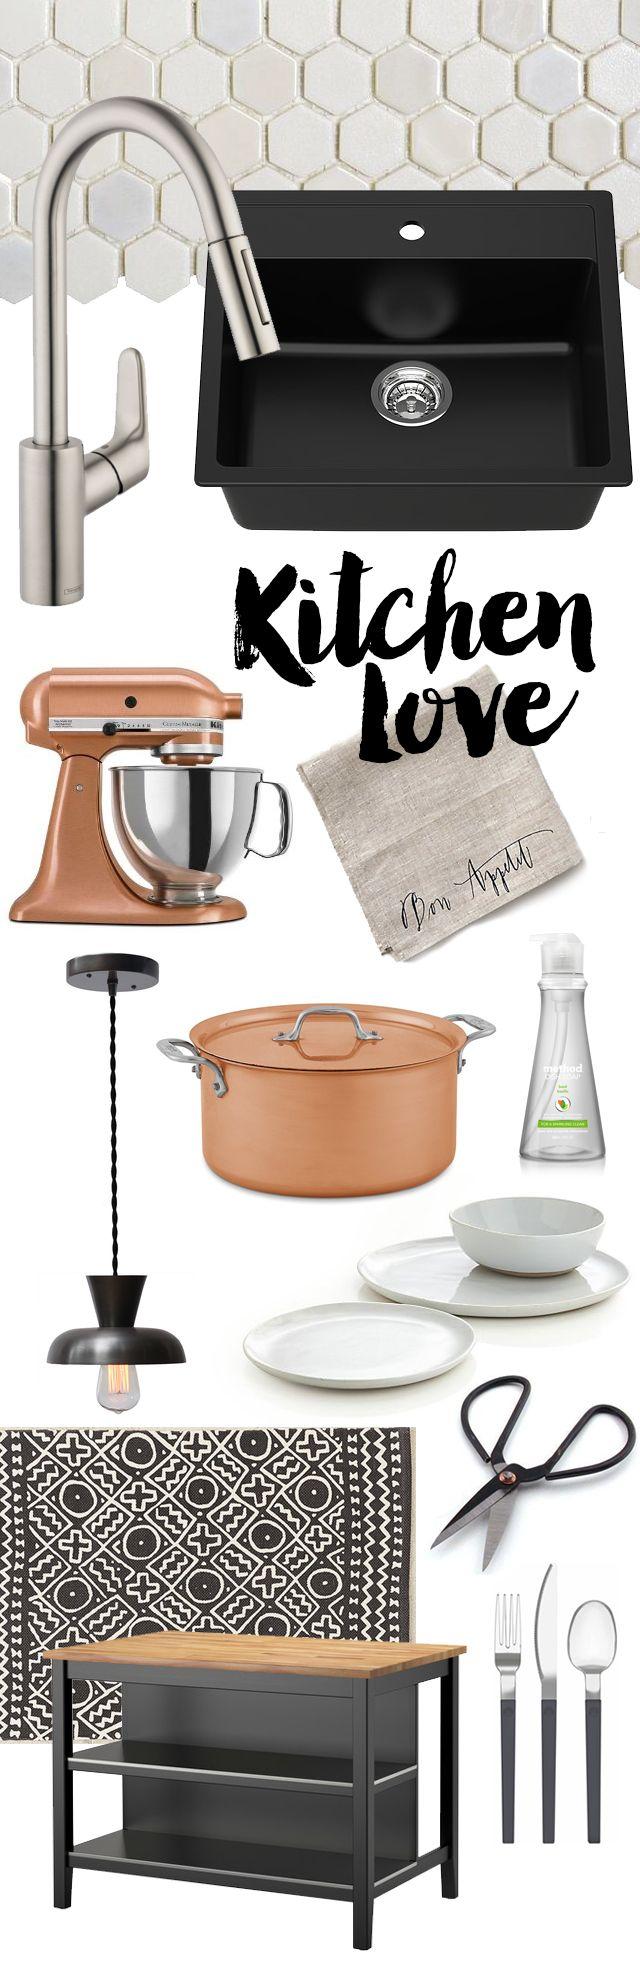 Best Black White And Copper Kitchen Inspiration Copper 400 x 300